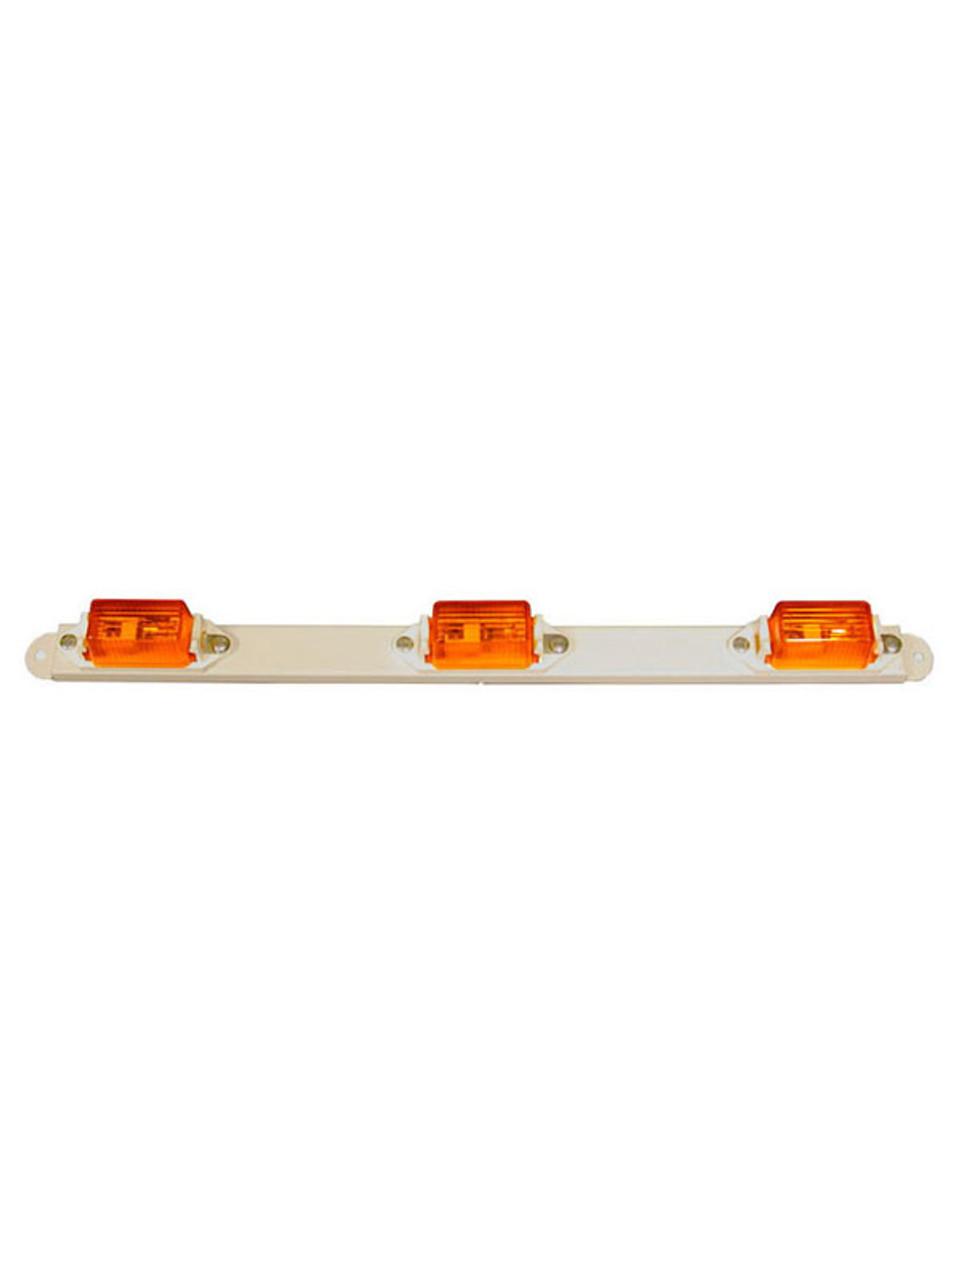 107-3A --- Amber Mini-Light Identification Light Bar